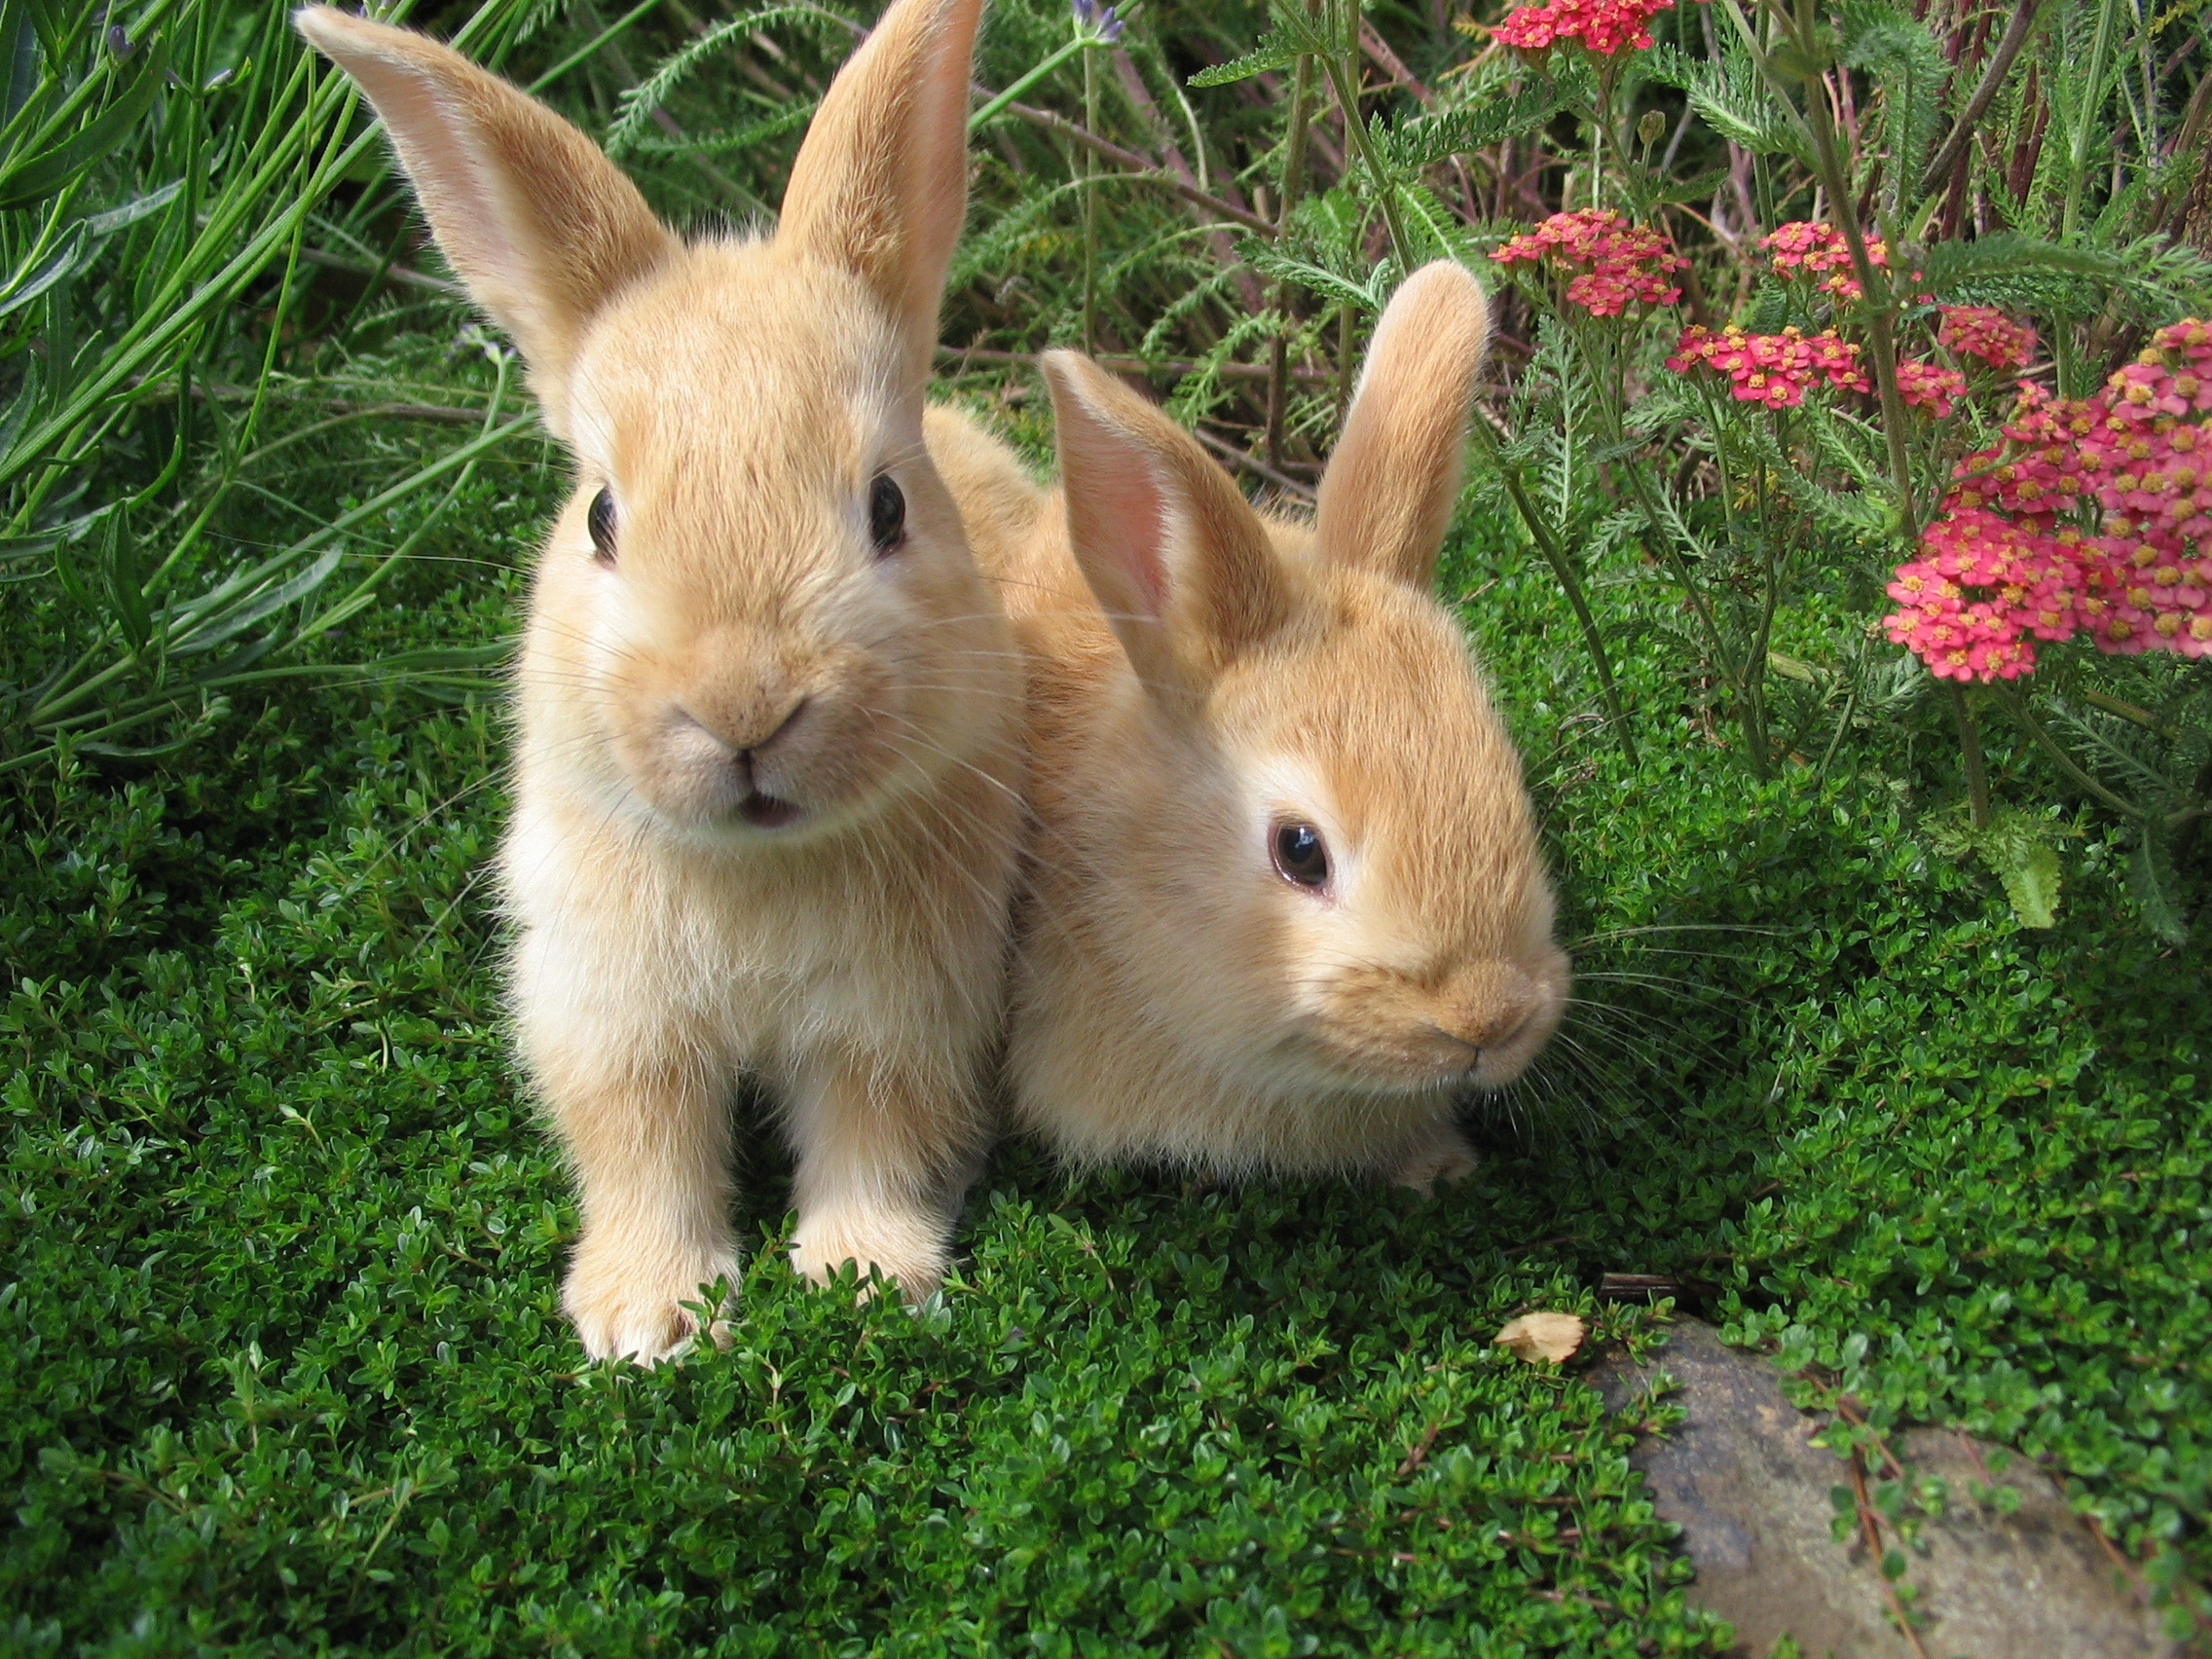 Raising Pet Rabbits